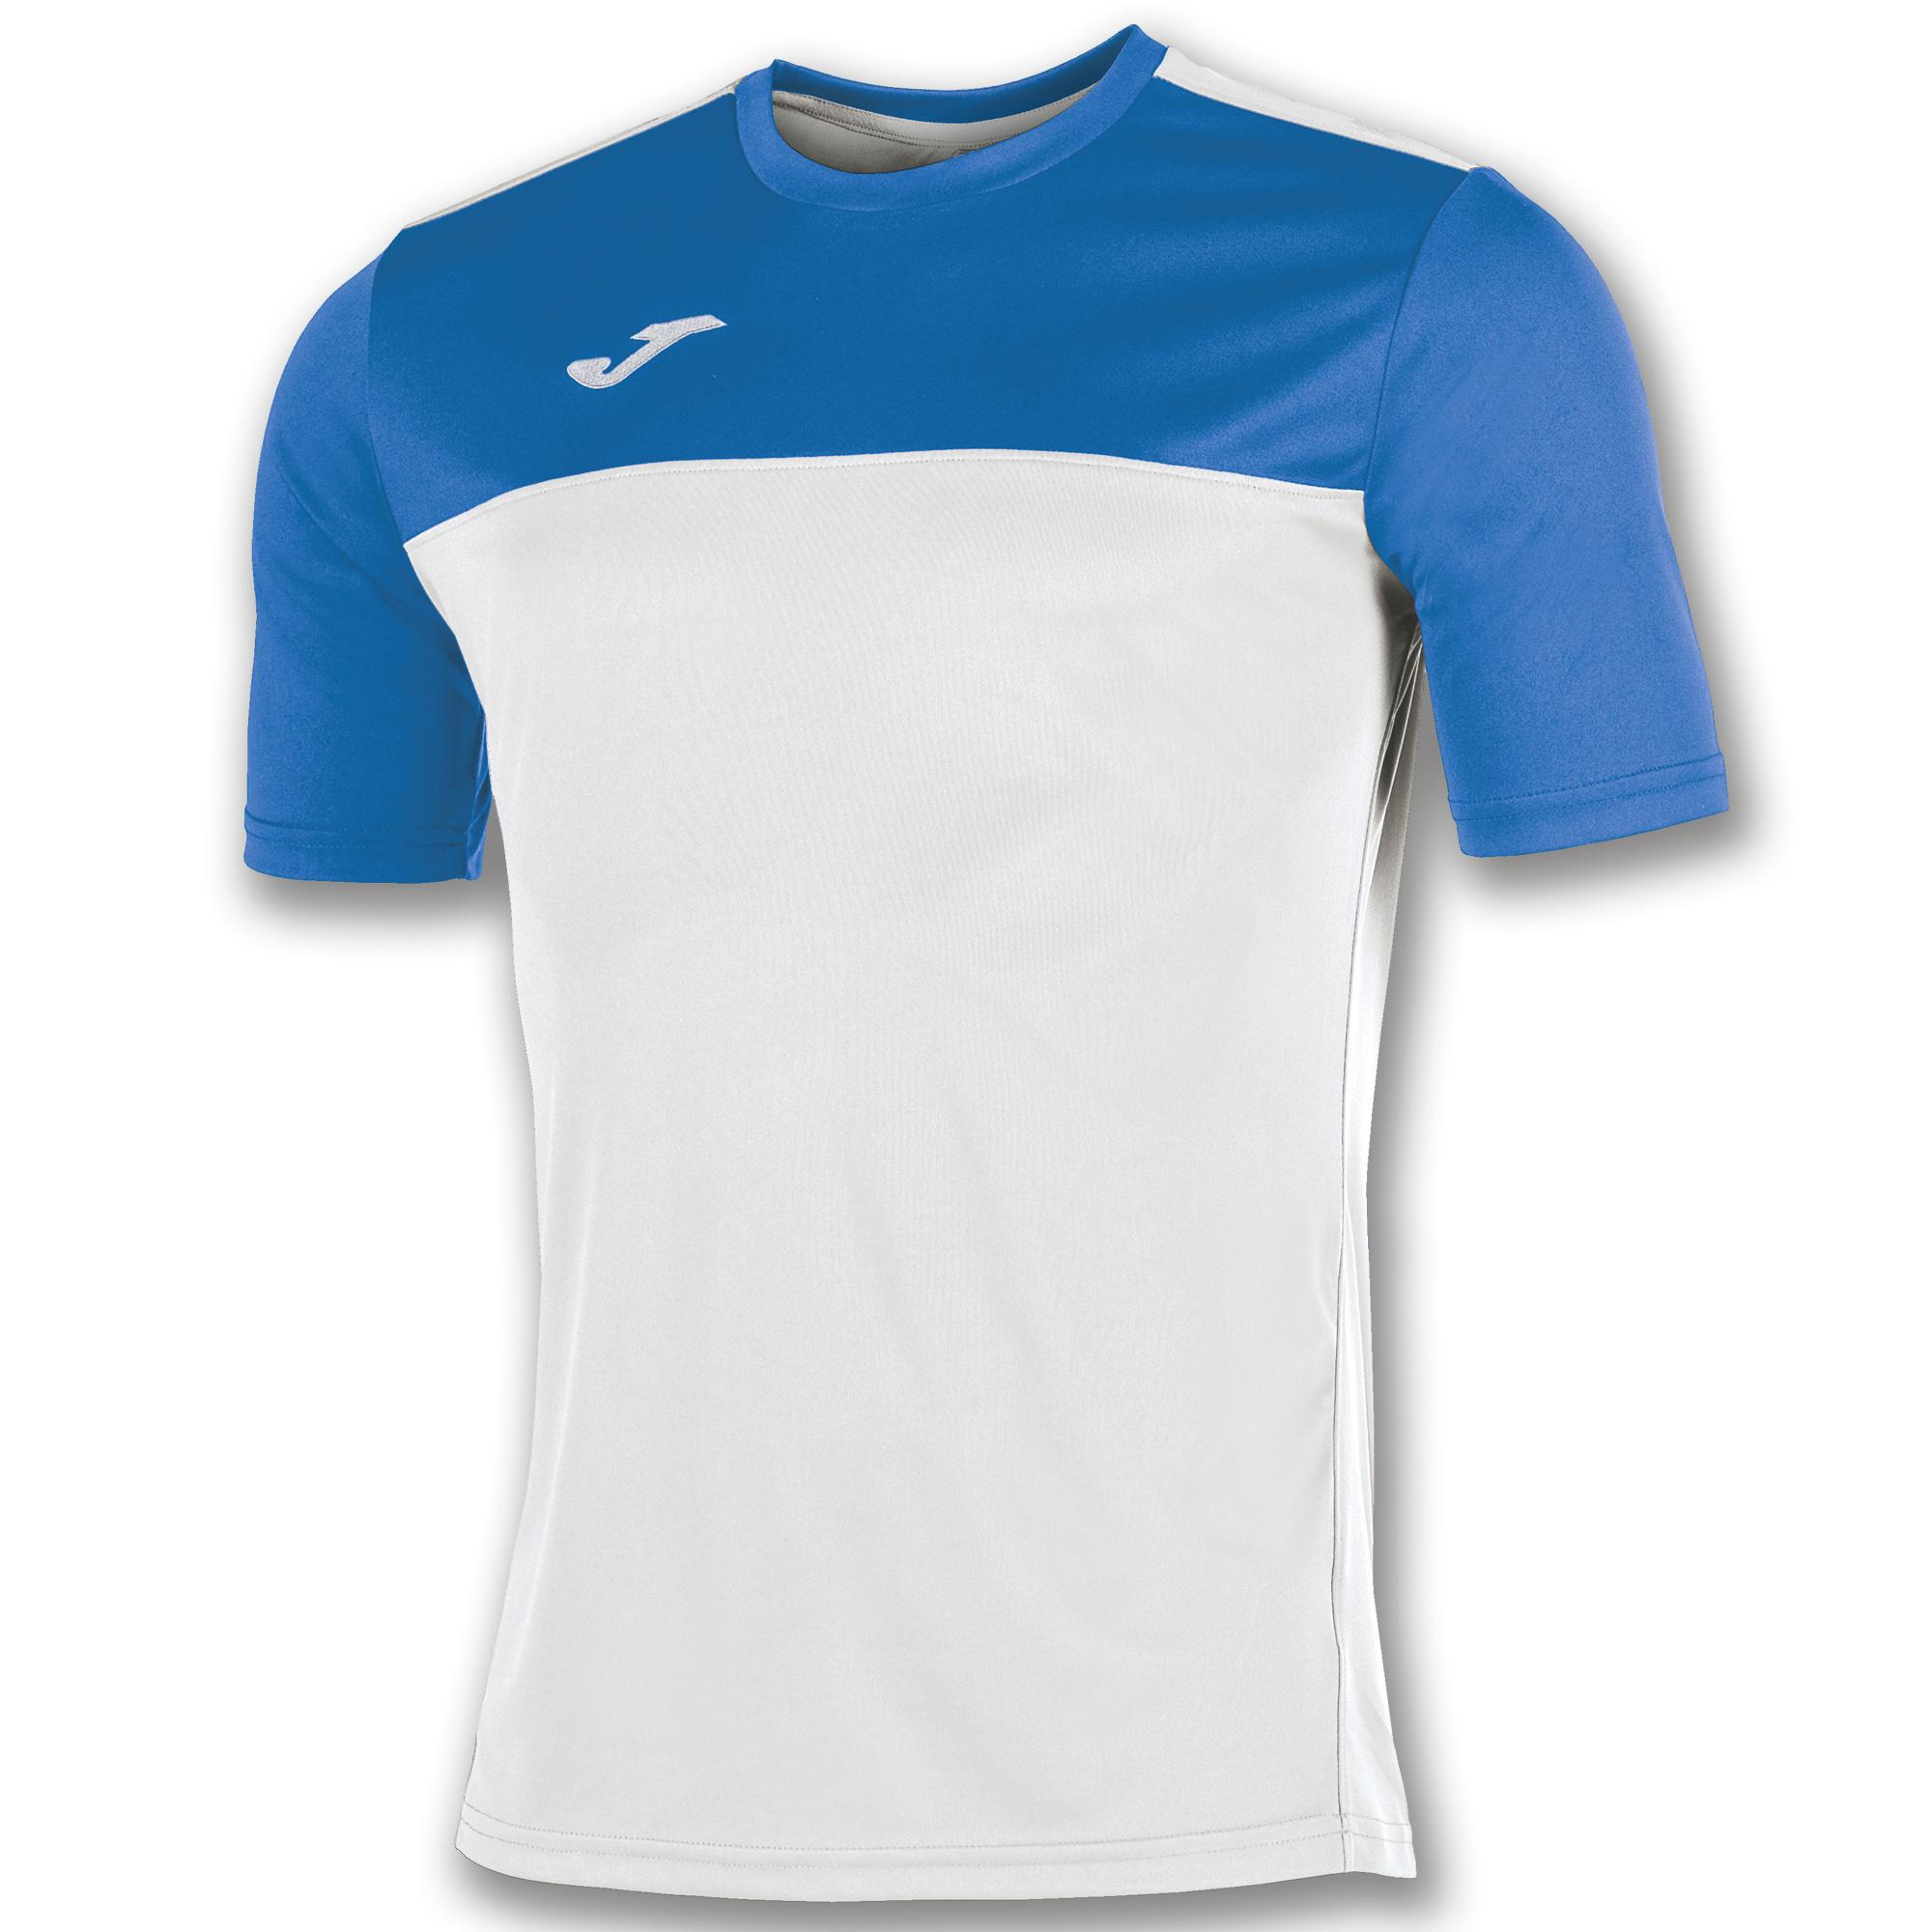 e437ed88dc5 Yükle (2000x2000)S S T-SHIRT WINNER WHITE-ROYAL BLUE JOMAS s t-shirt winner  white-royal blue - 1.